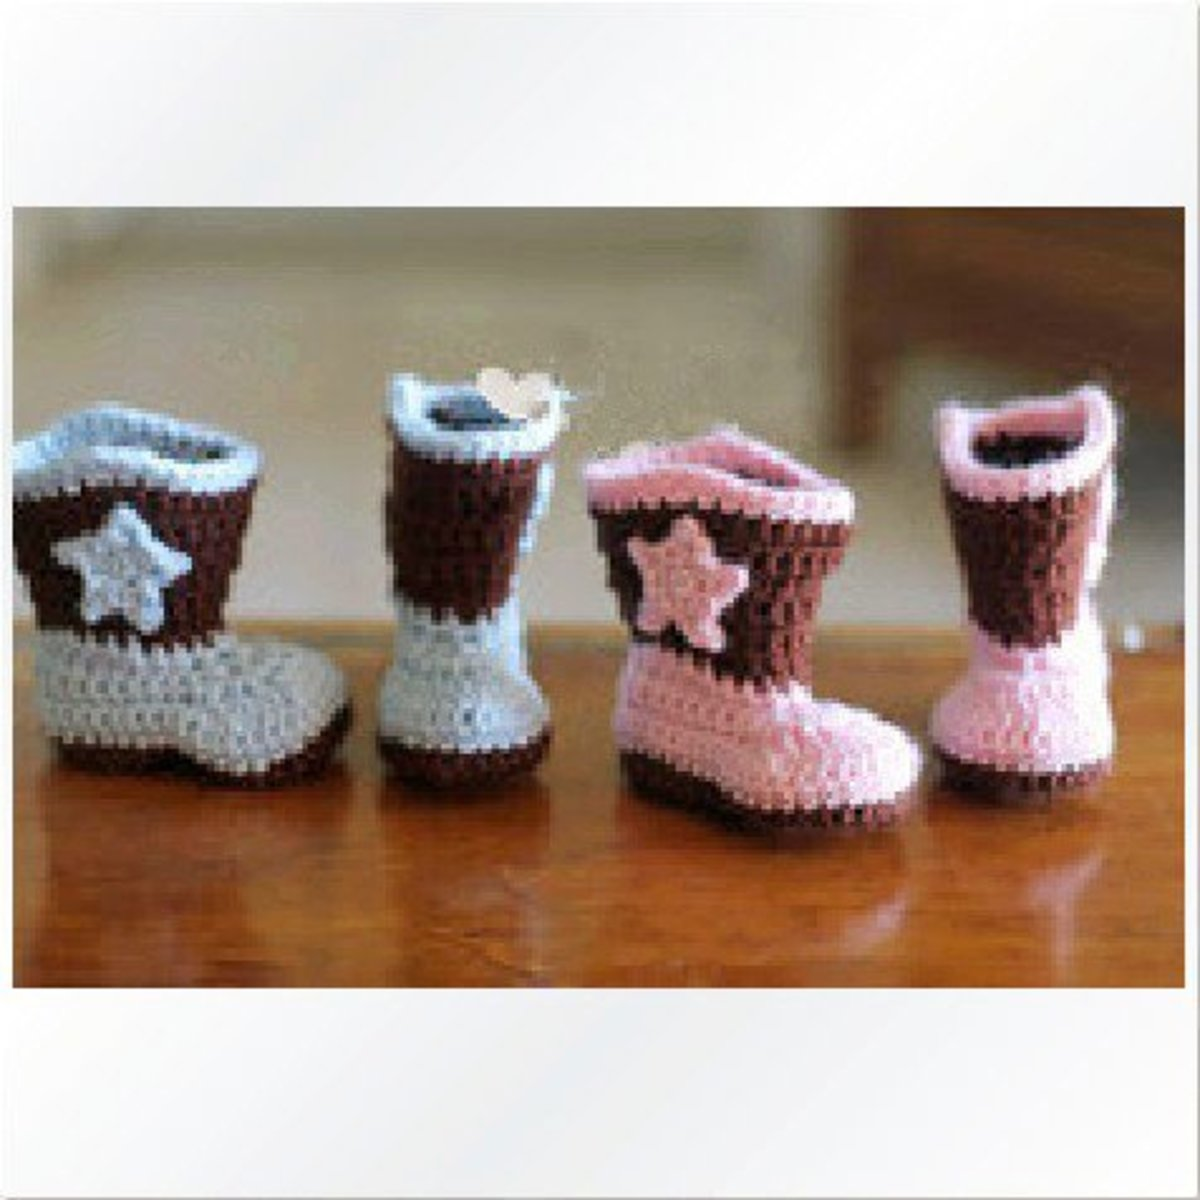 Baby cowboy boots on Amazon